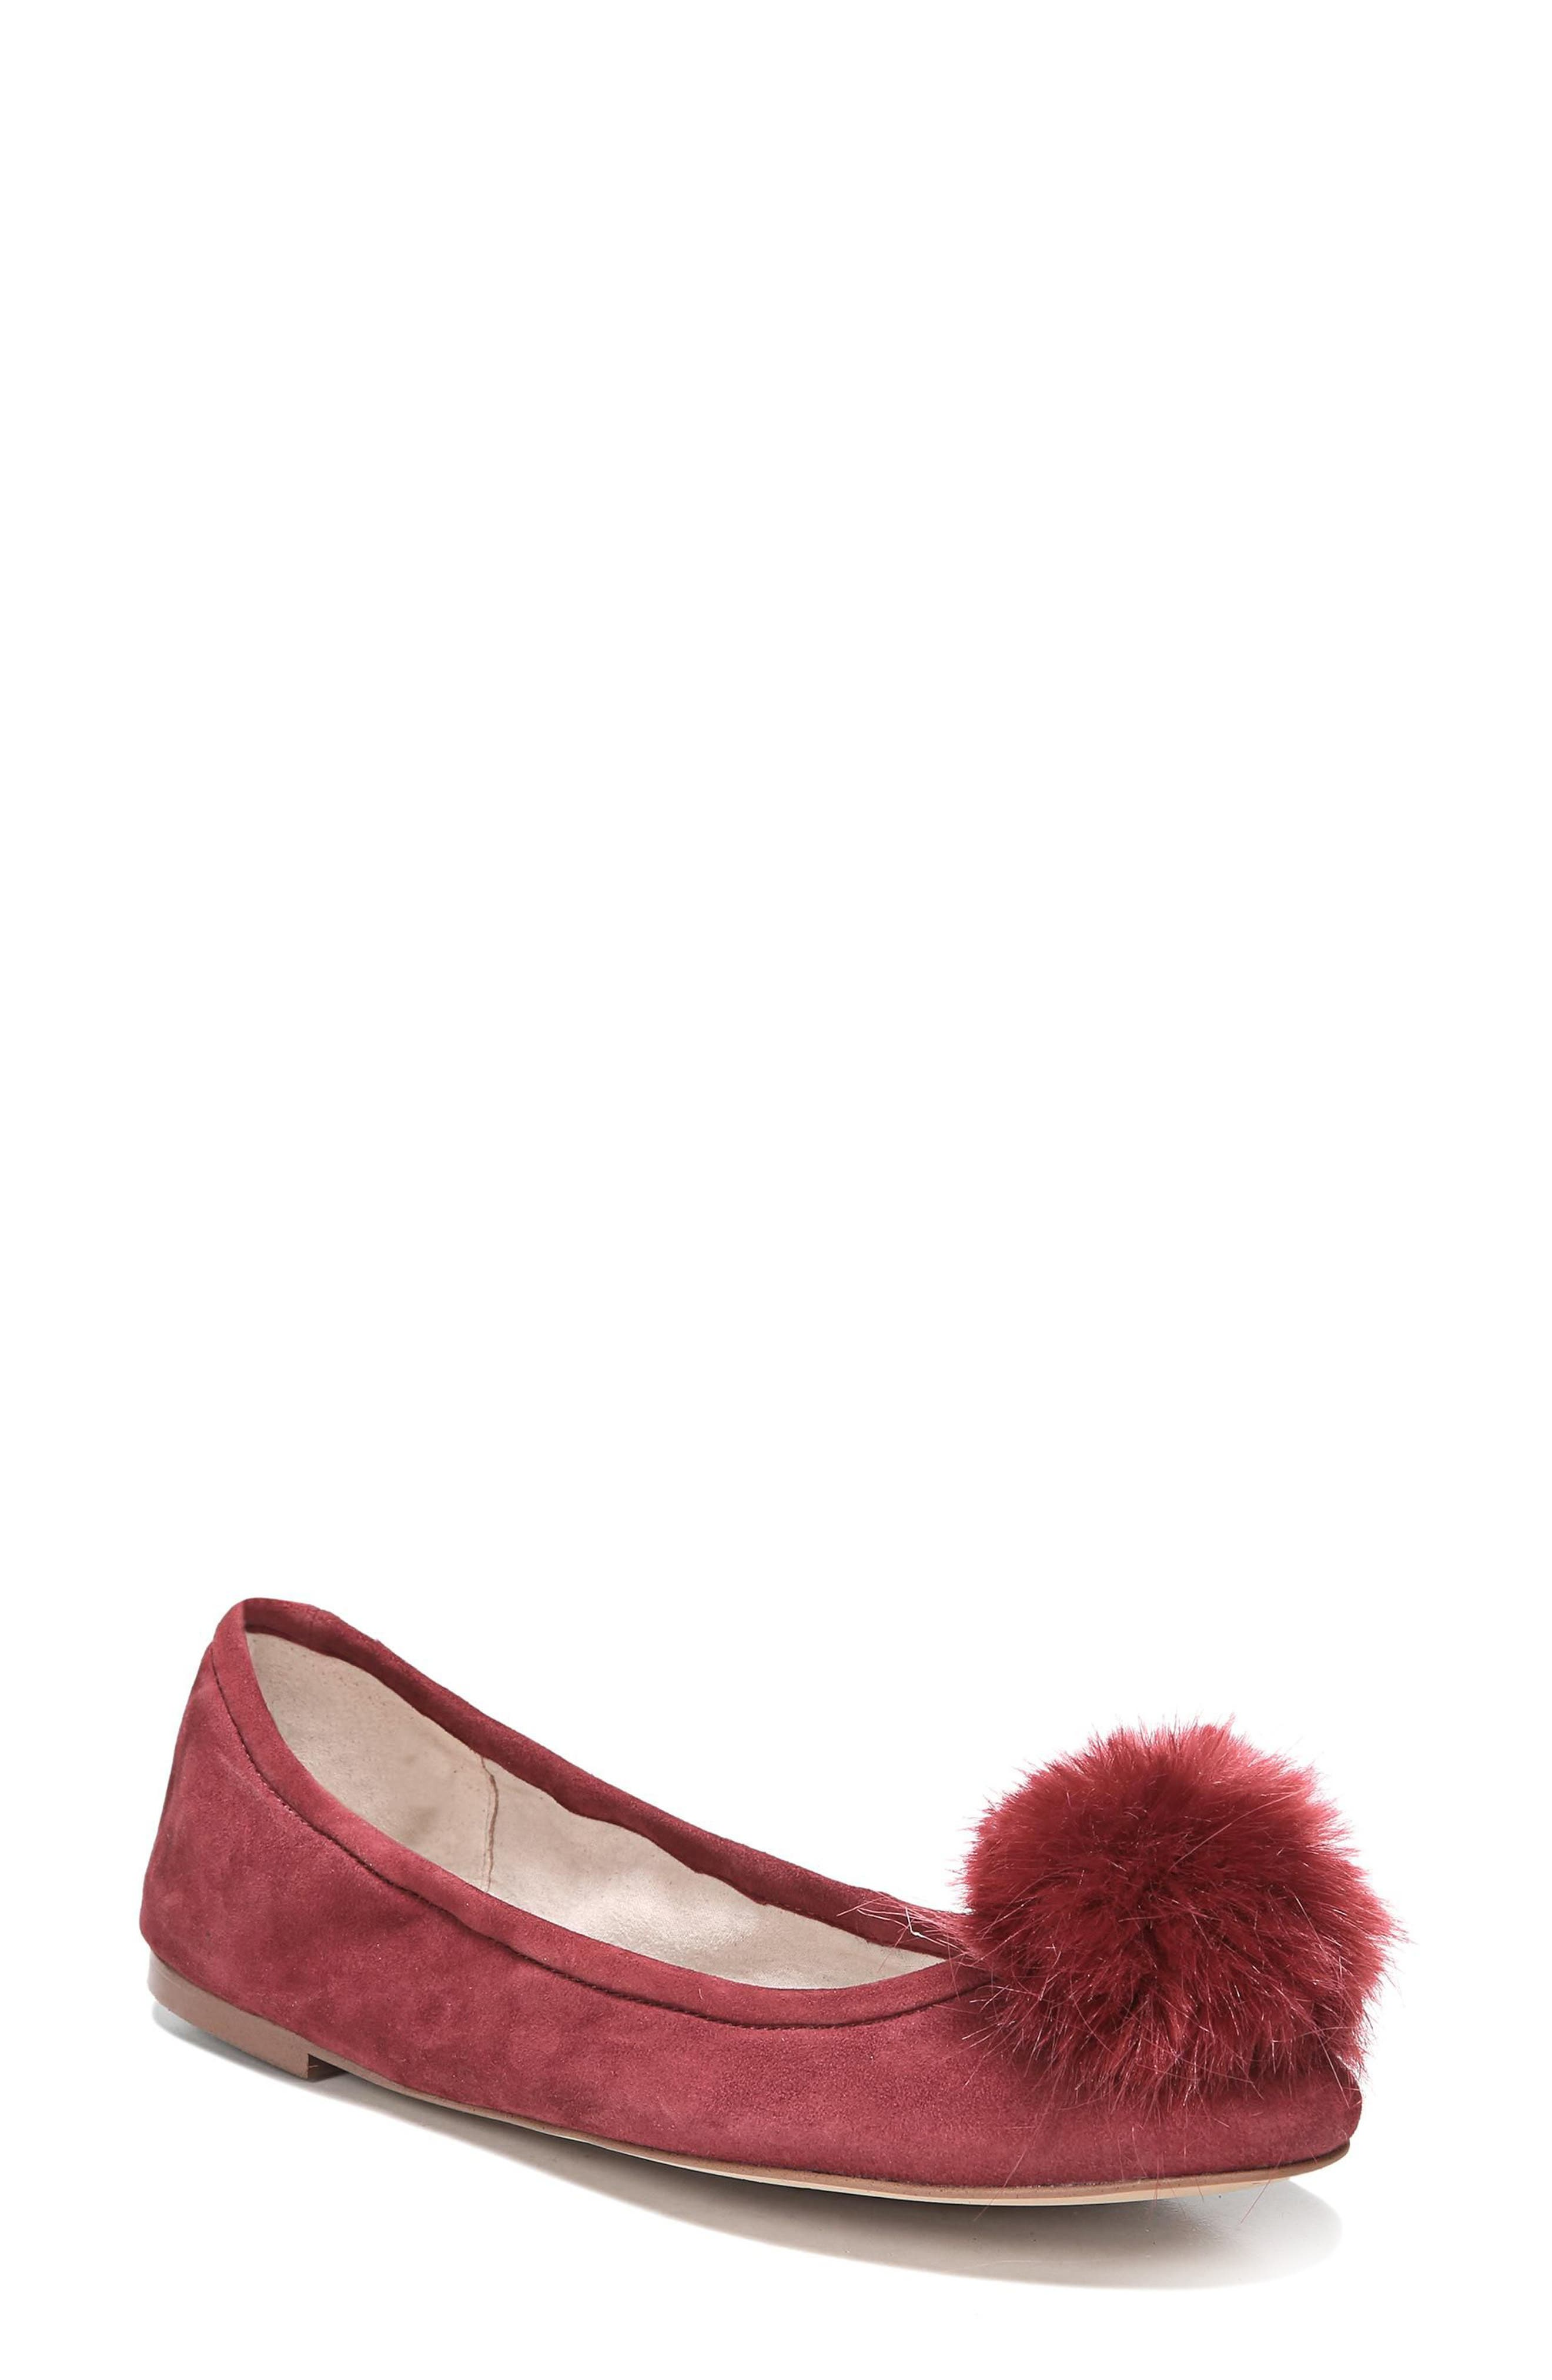 Alternate Image 1 Selected - Sam Edelman Farina Flat with Faux Fur Pompom (Women)